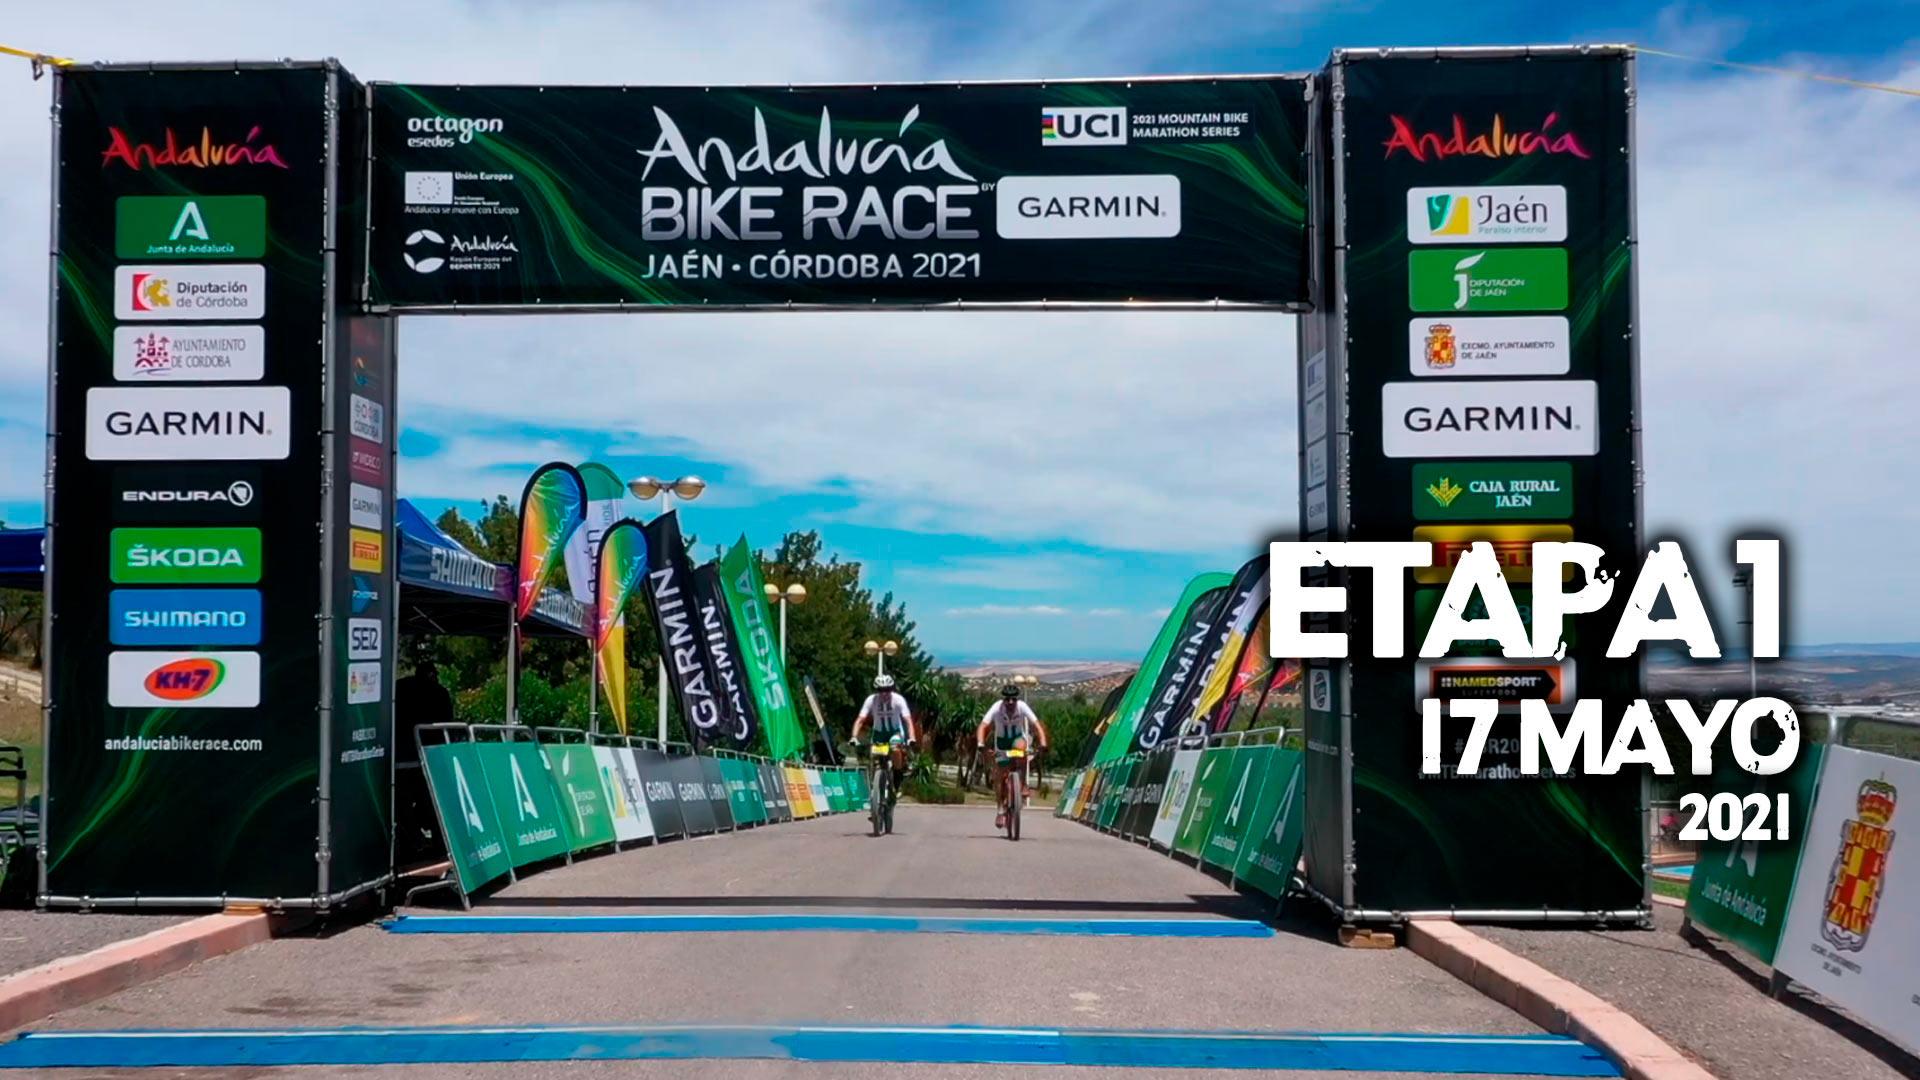 Andalucía Bike Race 2021 Etapa 1